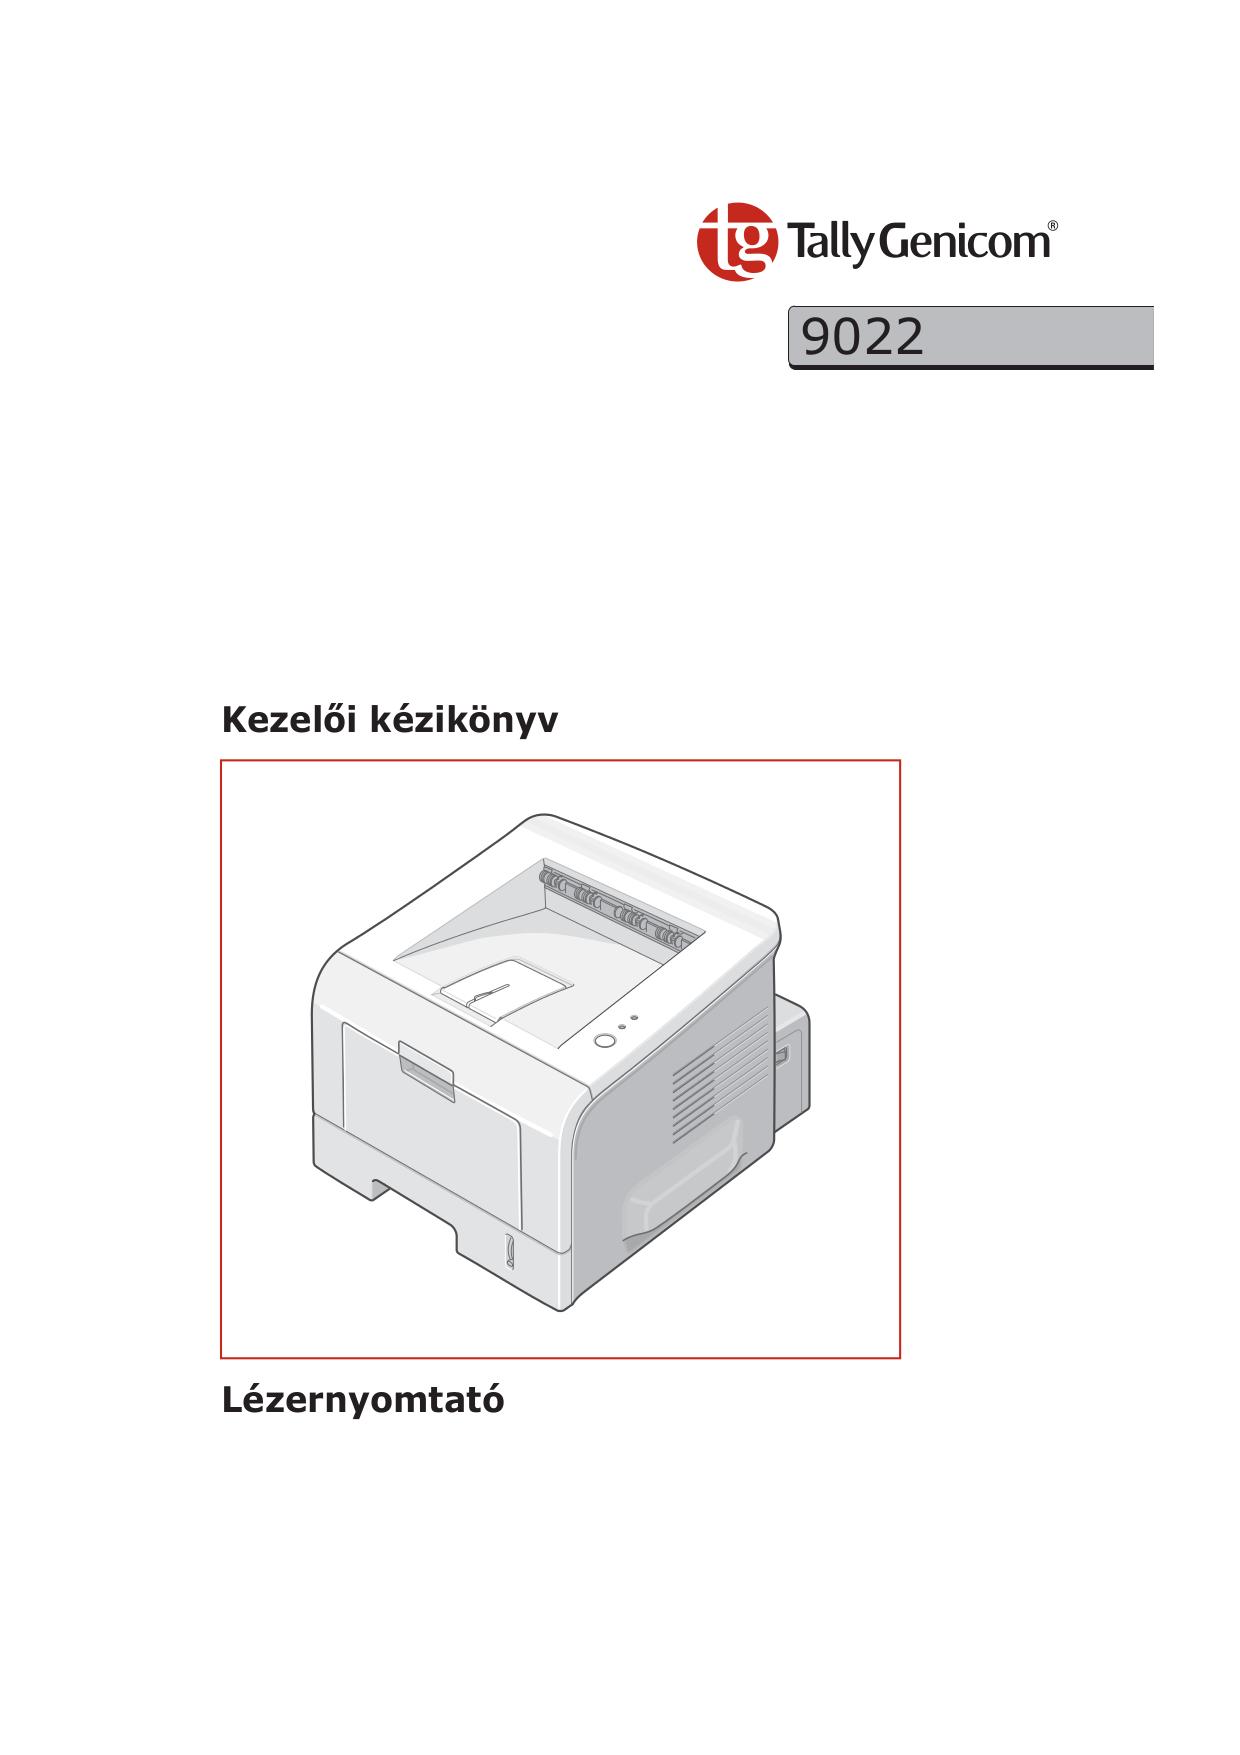 SOLVED Hi i have a printer tallygenicom and my os - Fixya